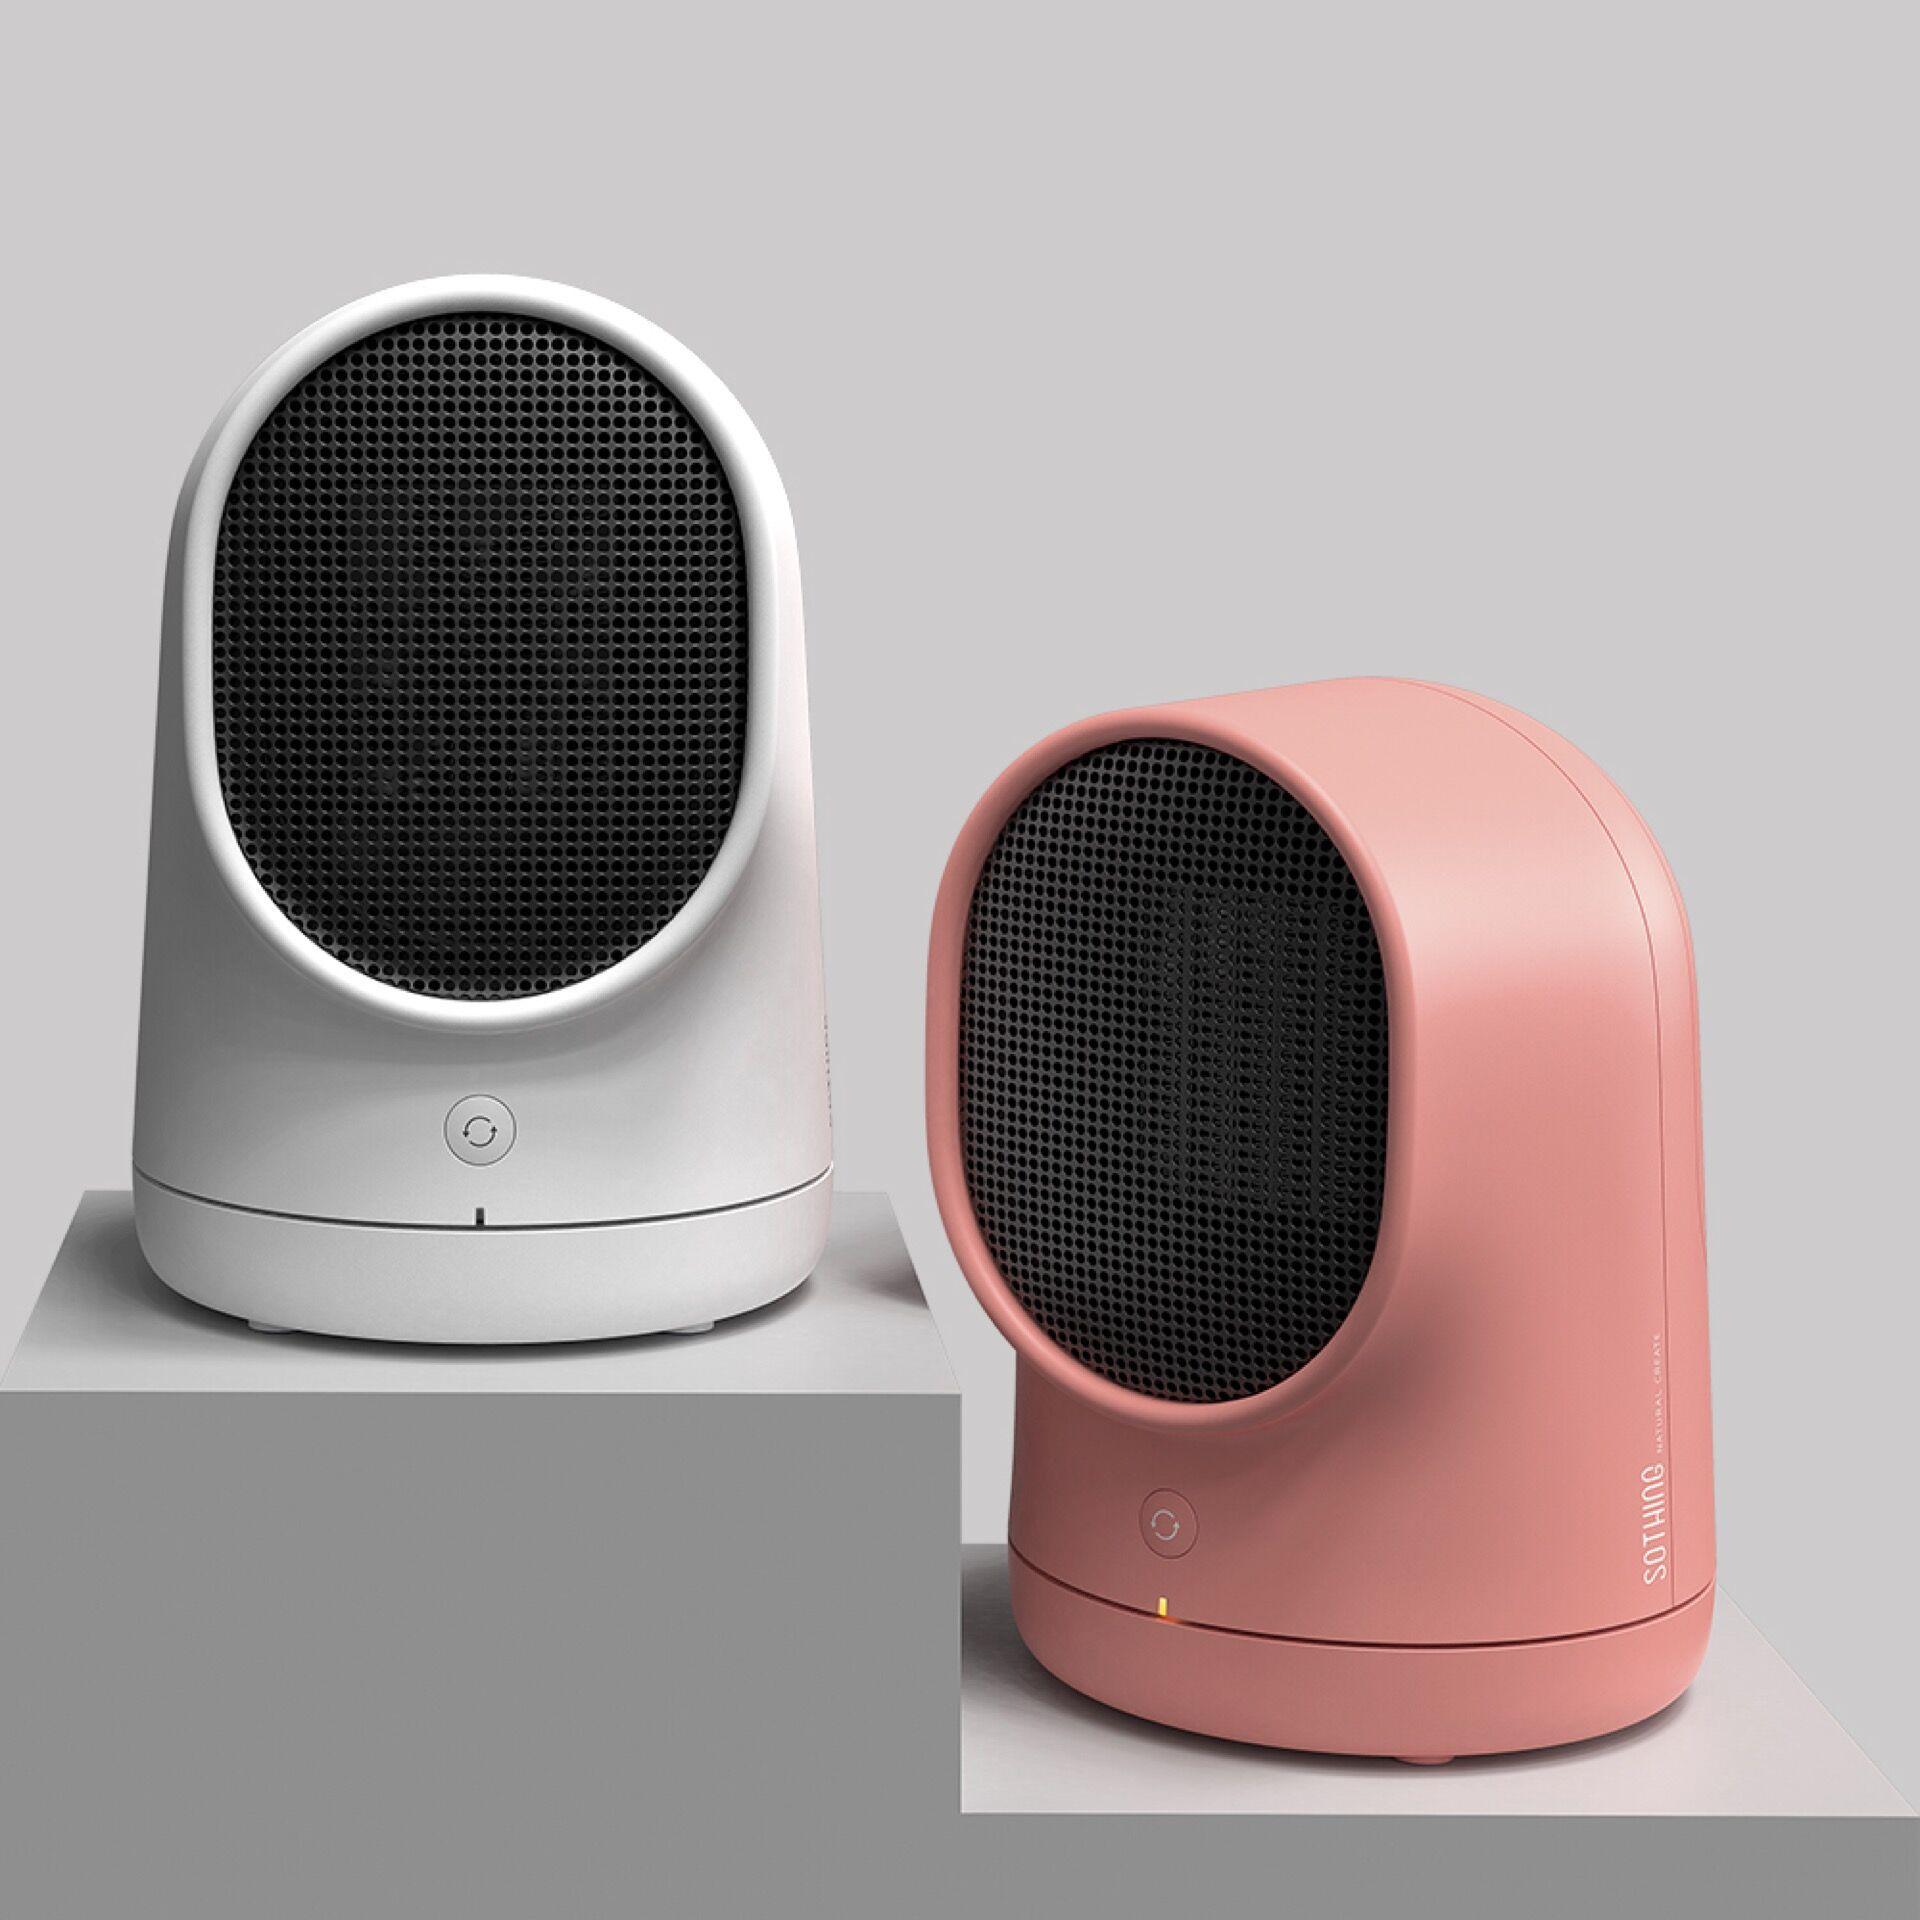 Mini Fashion Portable Electronic Heater Office Miniature Desktop Heater Hot Air Blower Can Shake The Head Energy Saving